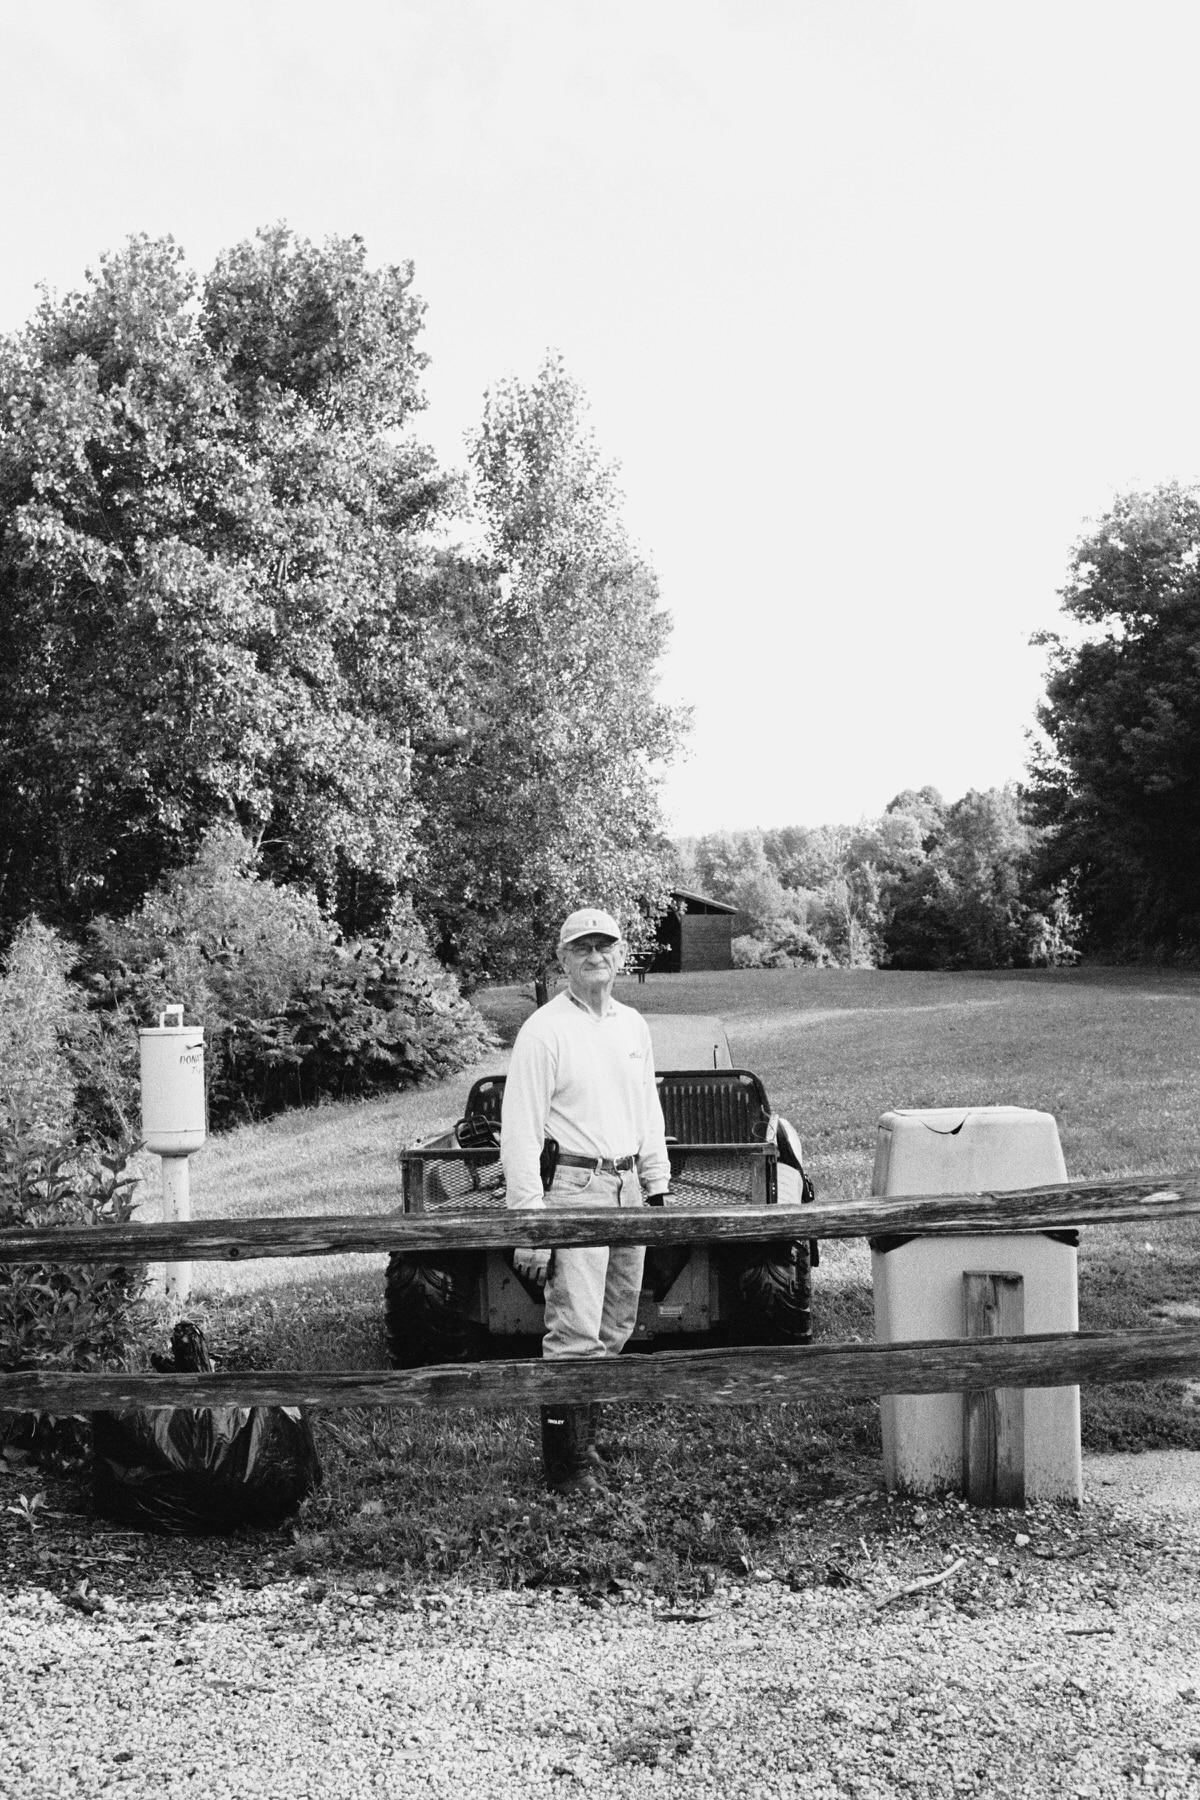 Kiekhaefer-Park-Fond-du-Lac-Wisconsin-black-and-white-fine-art-film-photography-by-Studio-L-photographer-Laura-Schneider-_37A